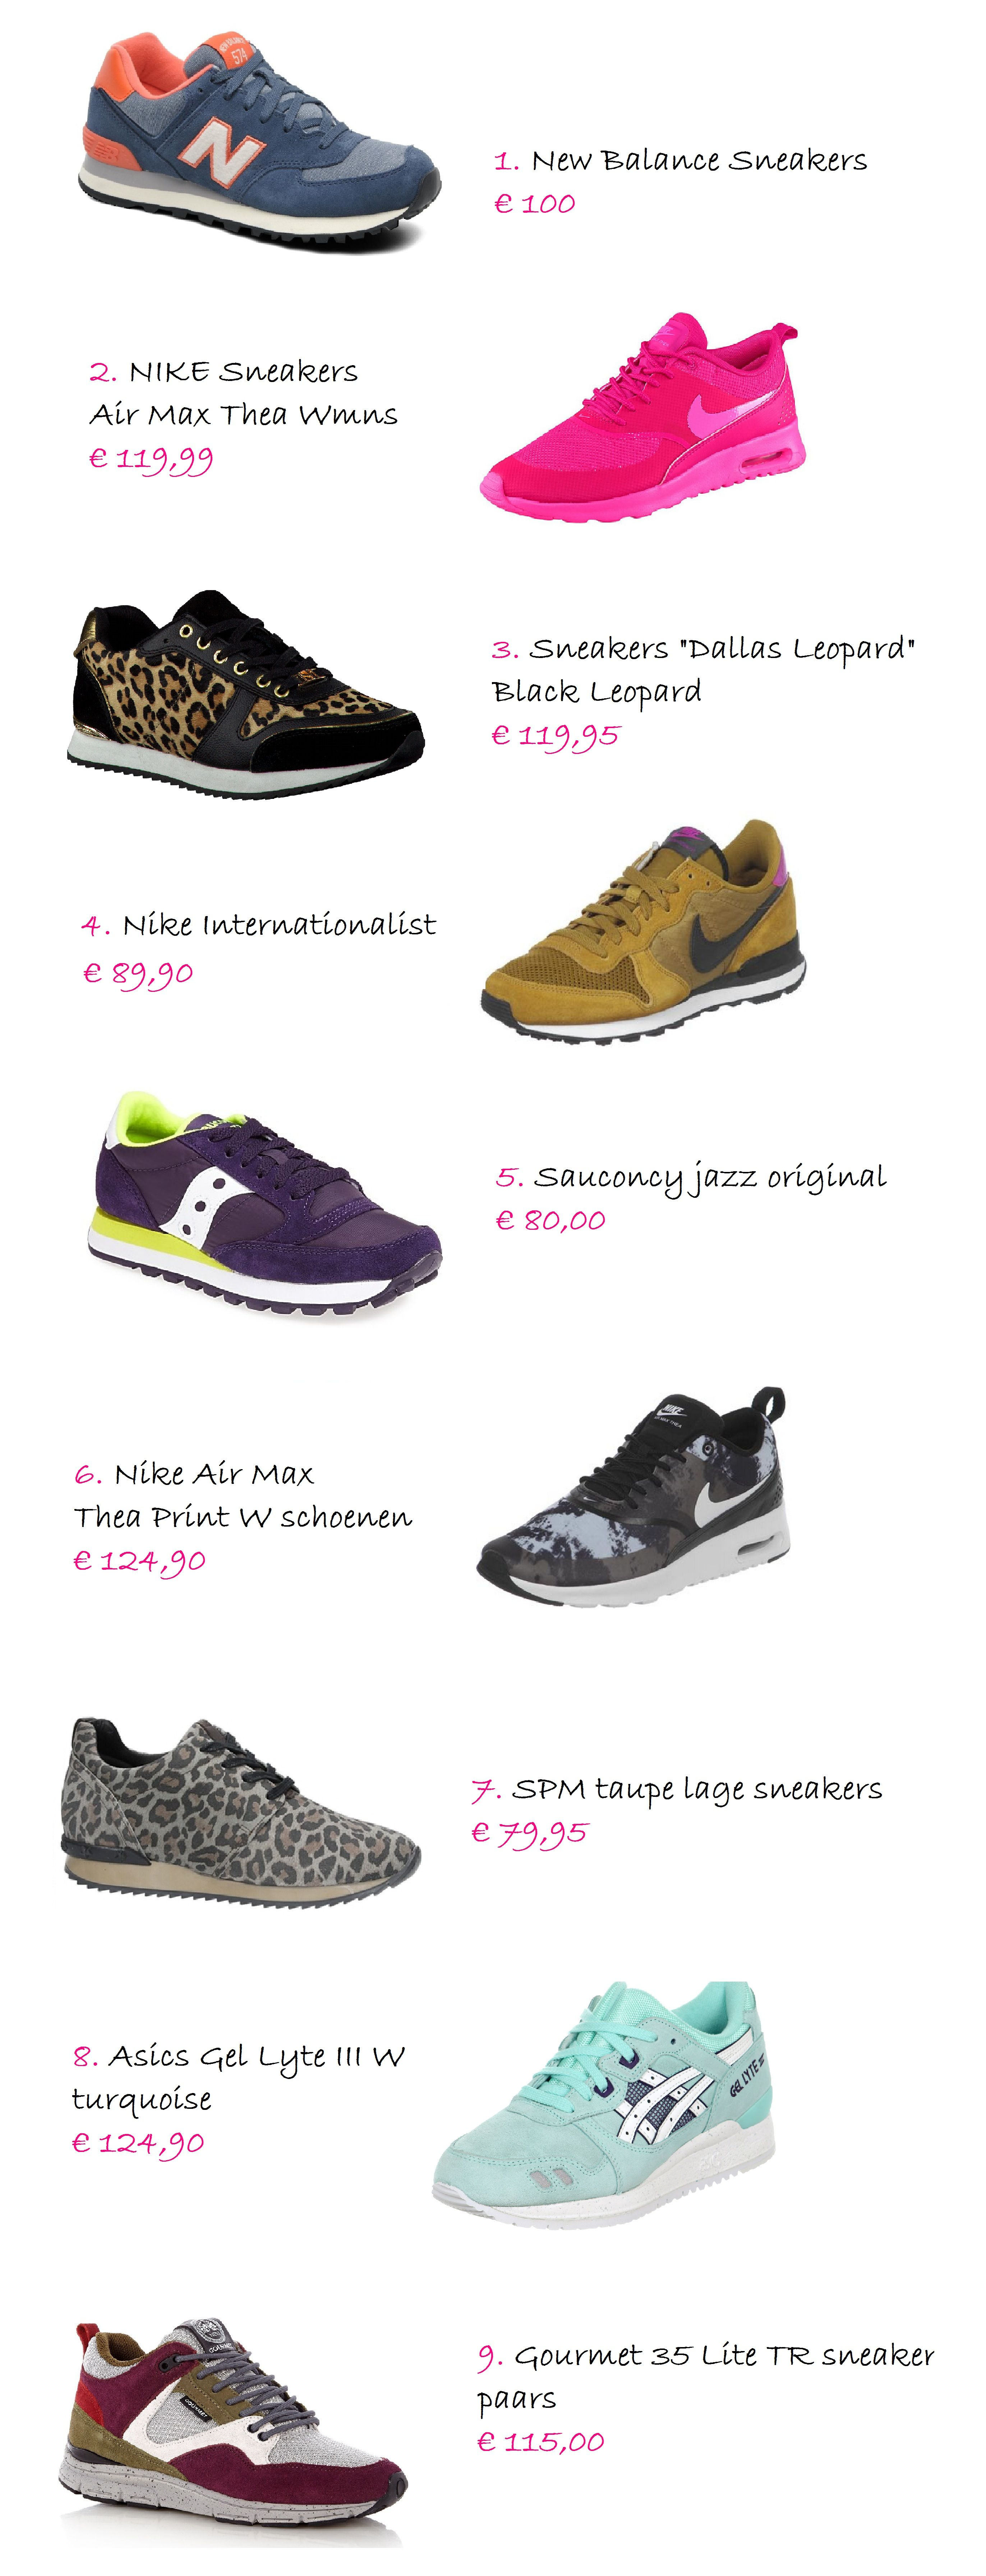 sneakers, gympen, nike, new balance, asics, schoenen, fashion, sneaker, sauconcy, nike air max,, sneakers dallas leopard, sneakers supertrash, nike internationalist, spm sneakers, asics gel lyte, gourmet lite sneaker